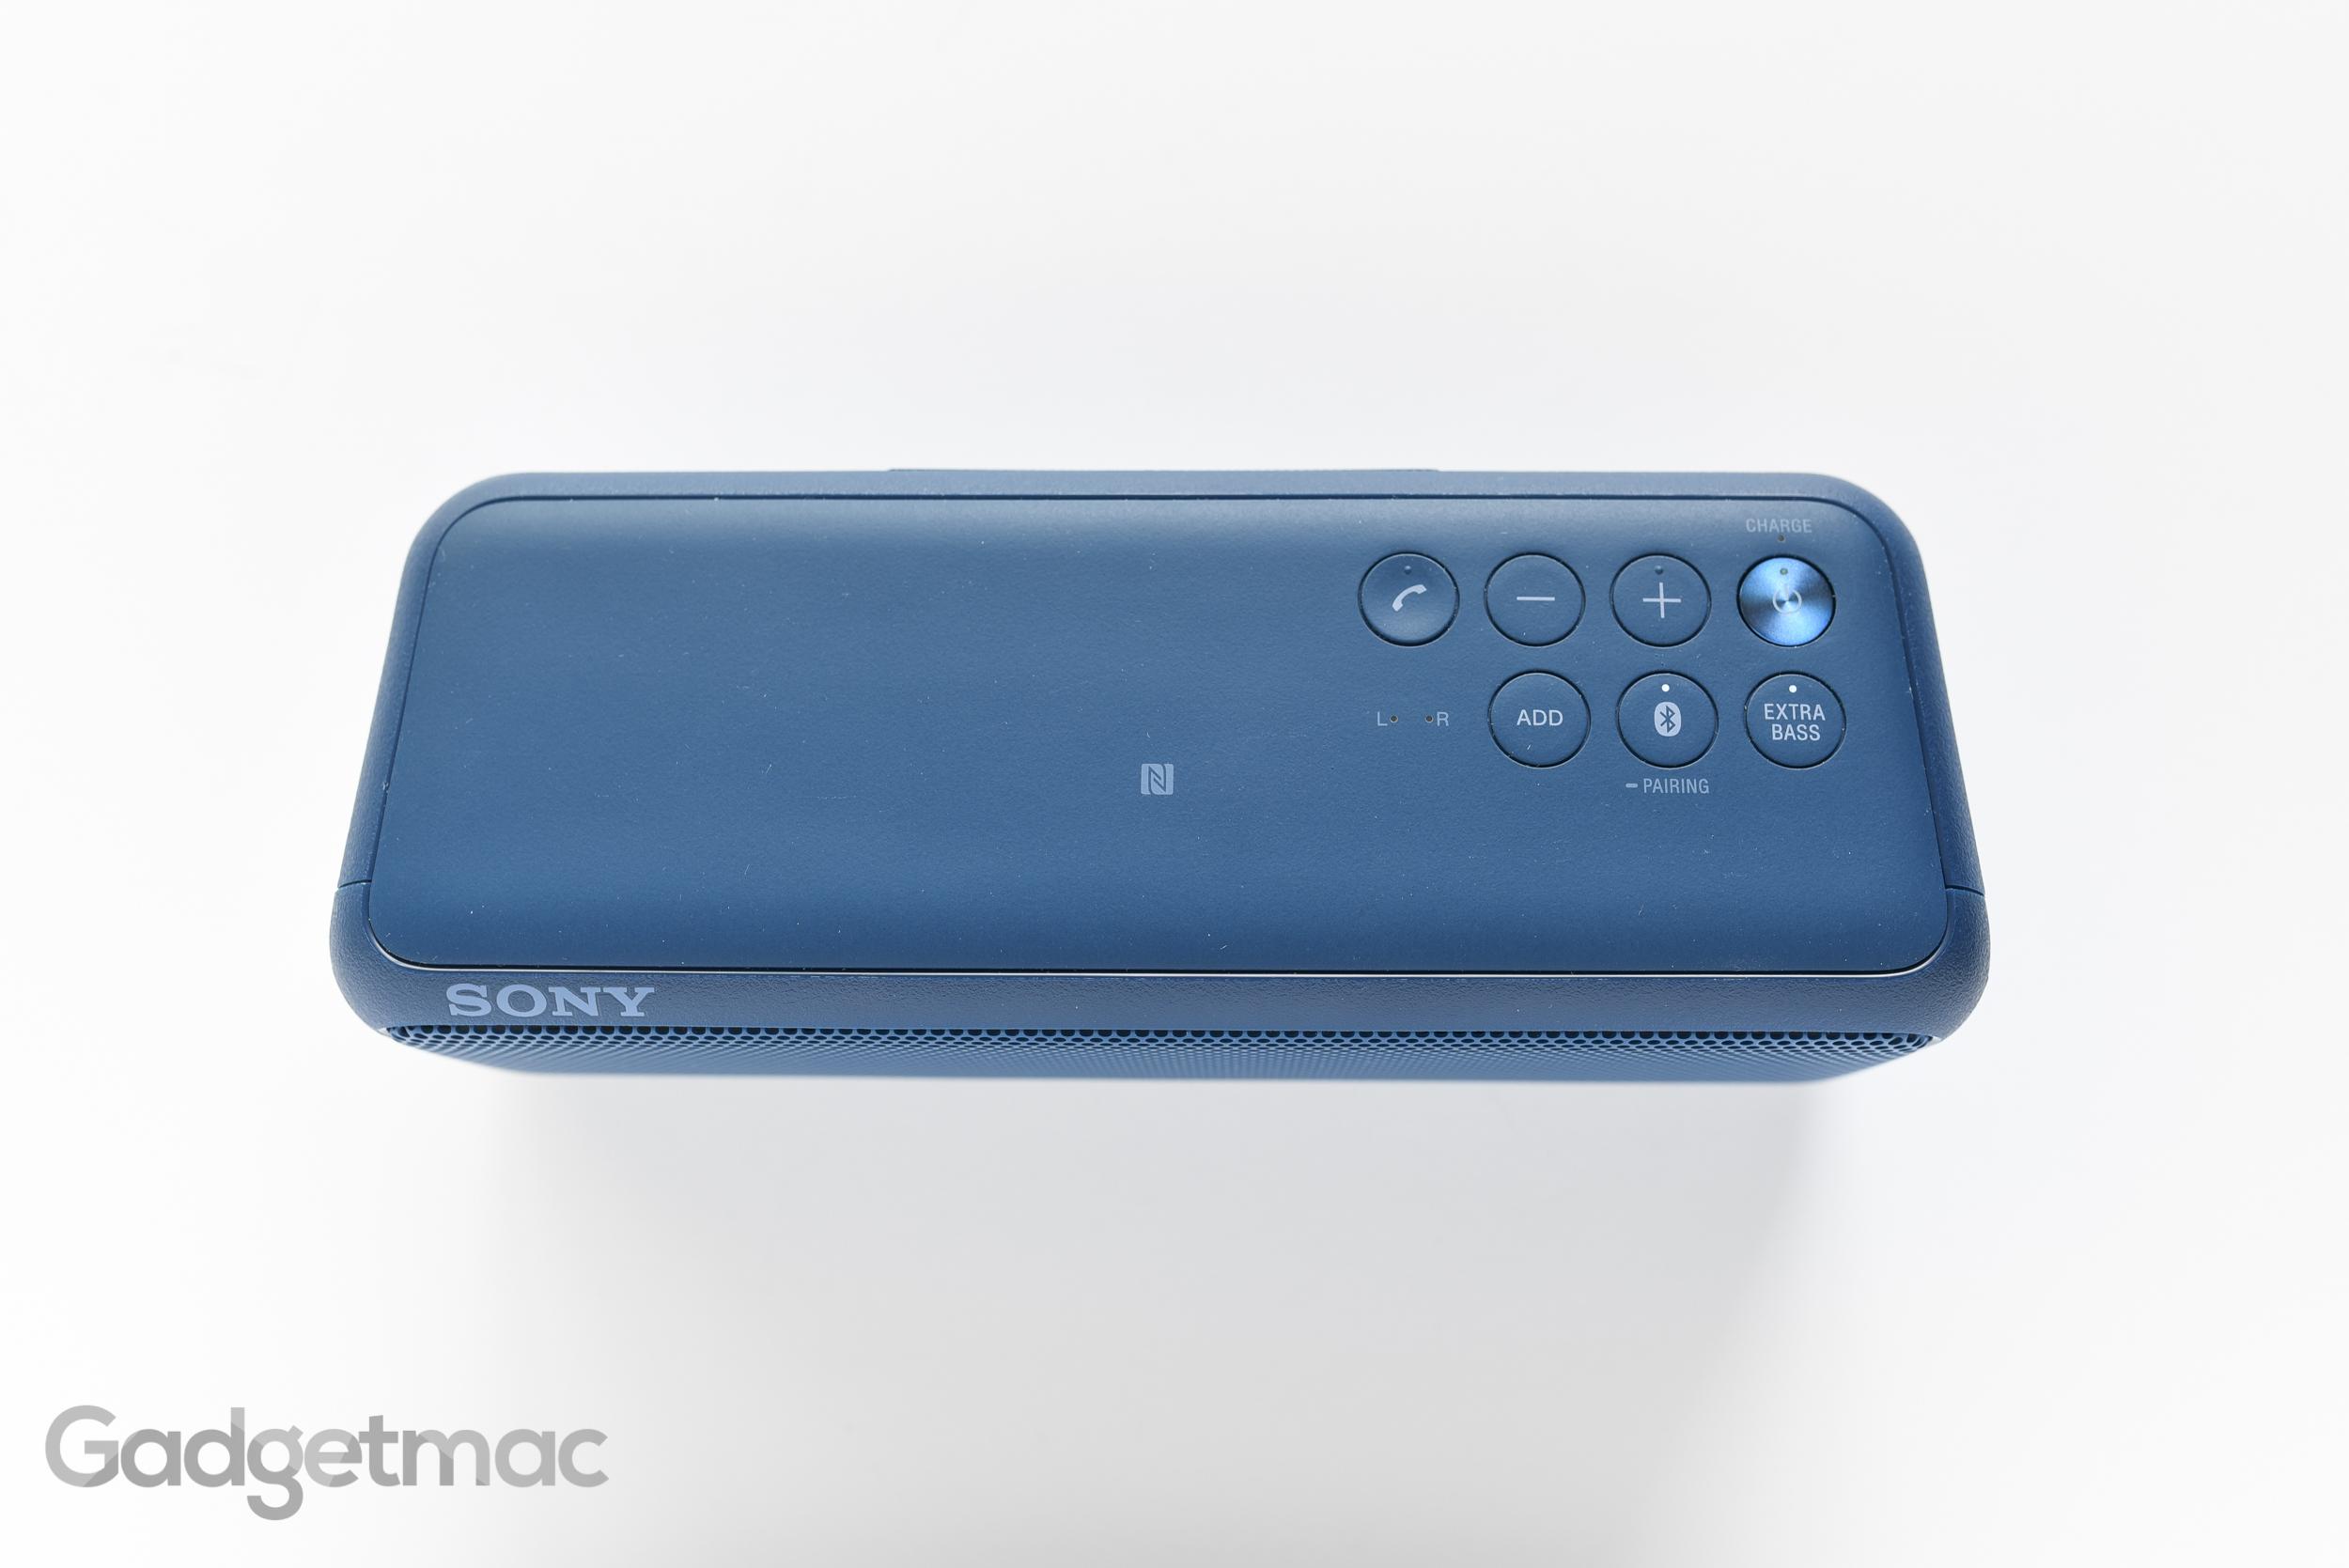 sony-srs-xb3-controls.jpg